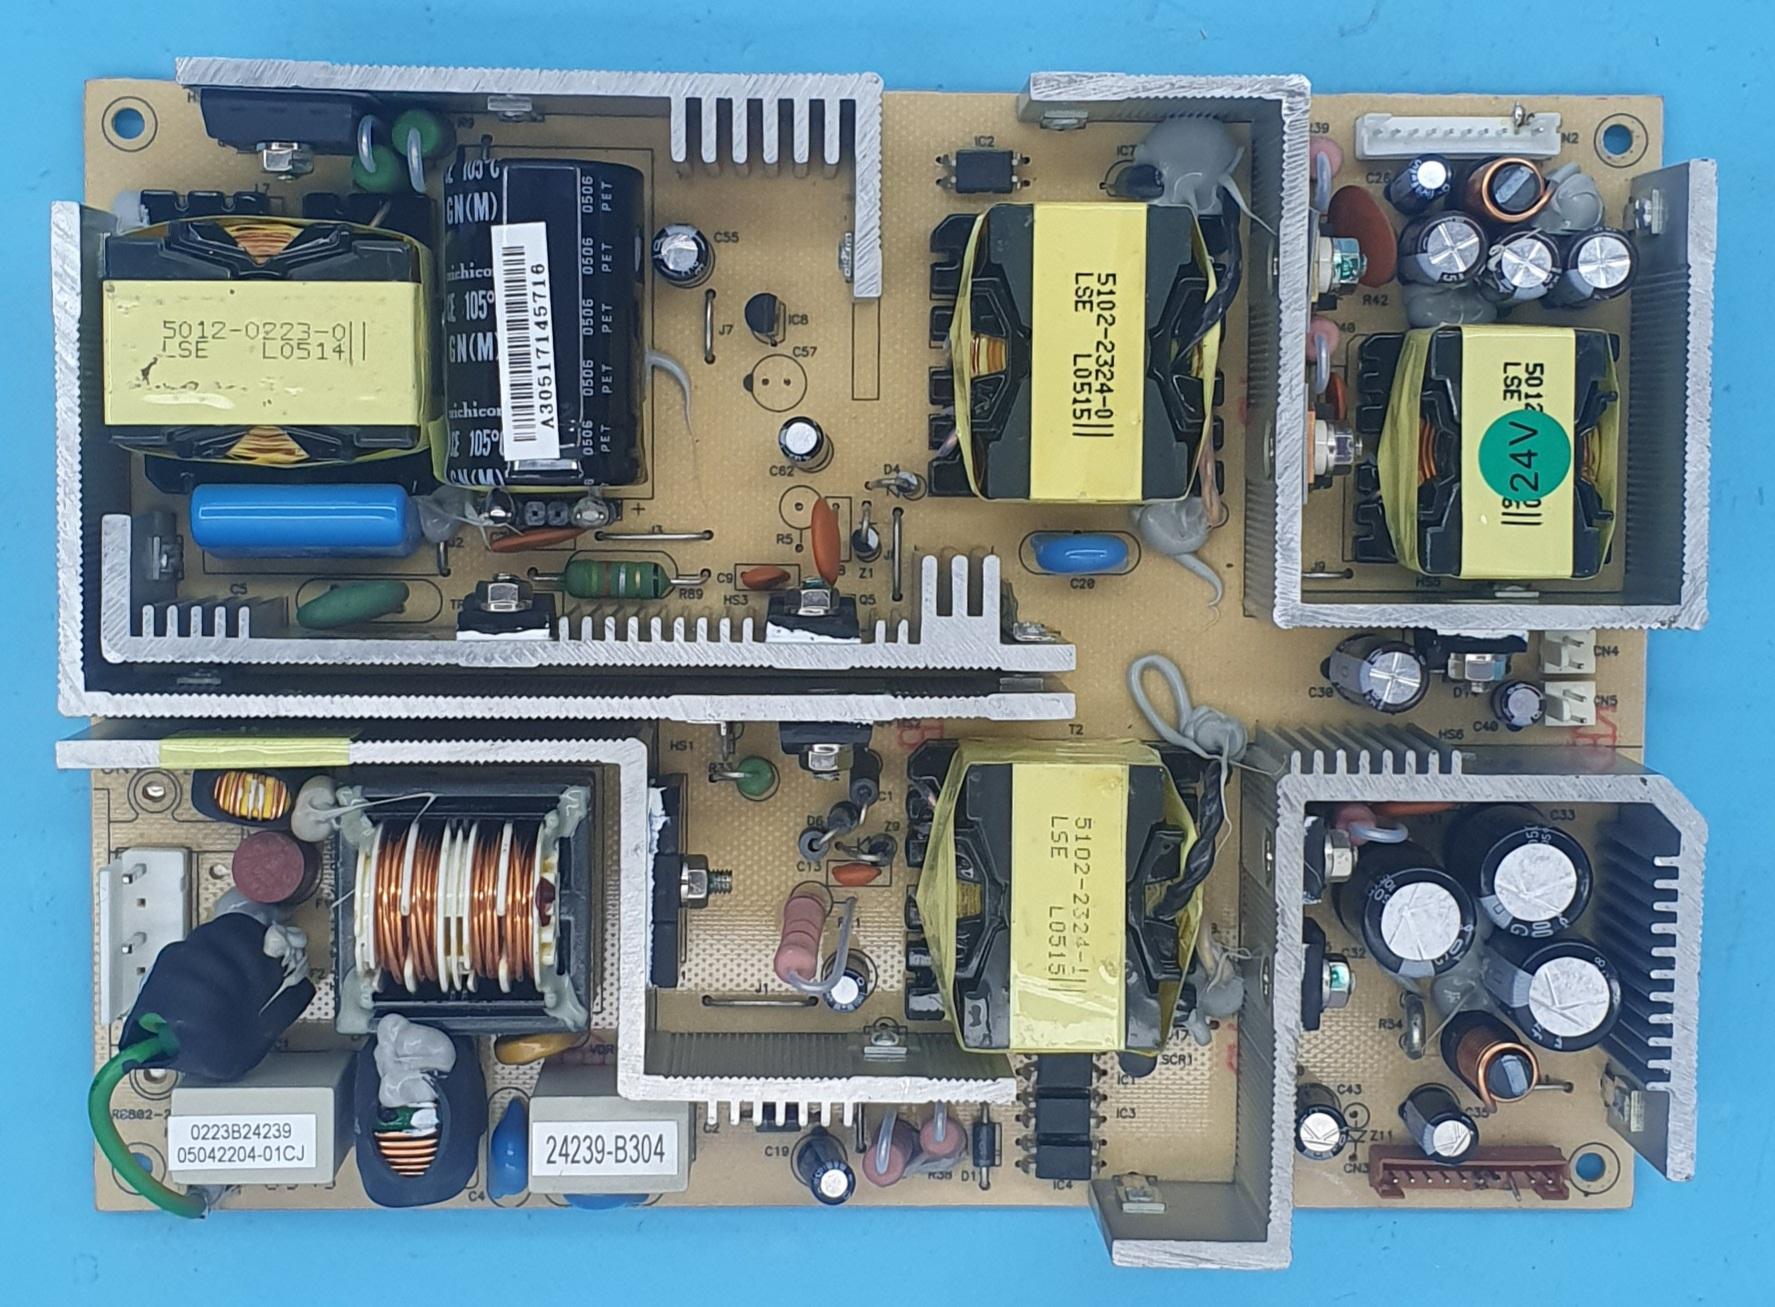 0223B24239 Vestel Power (KDV DAHİL = 130 TL)